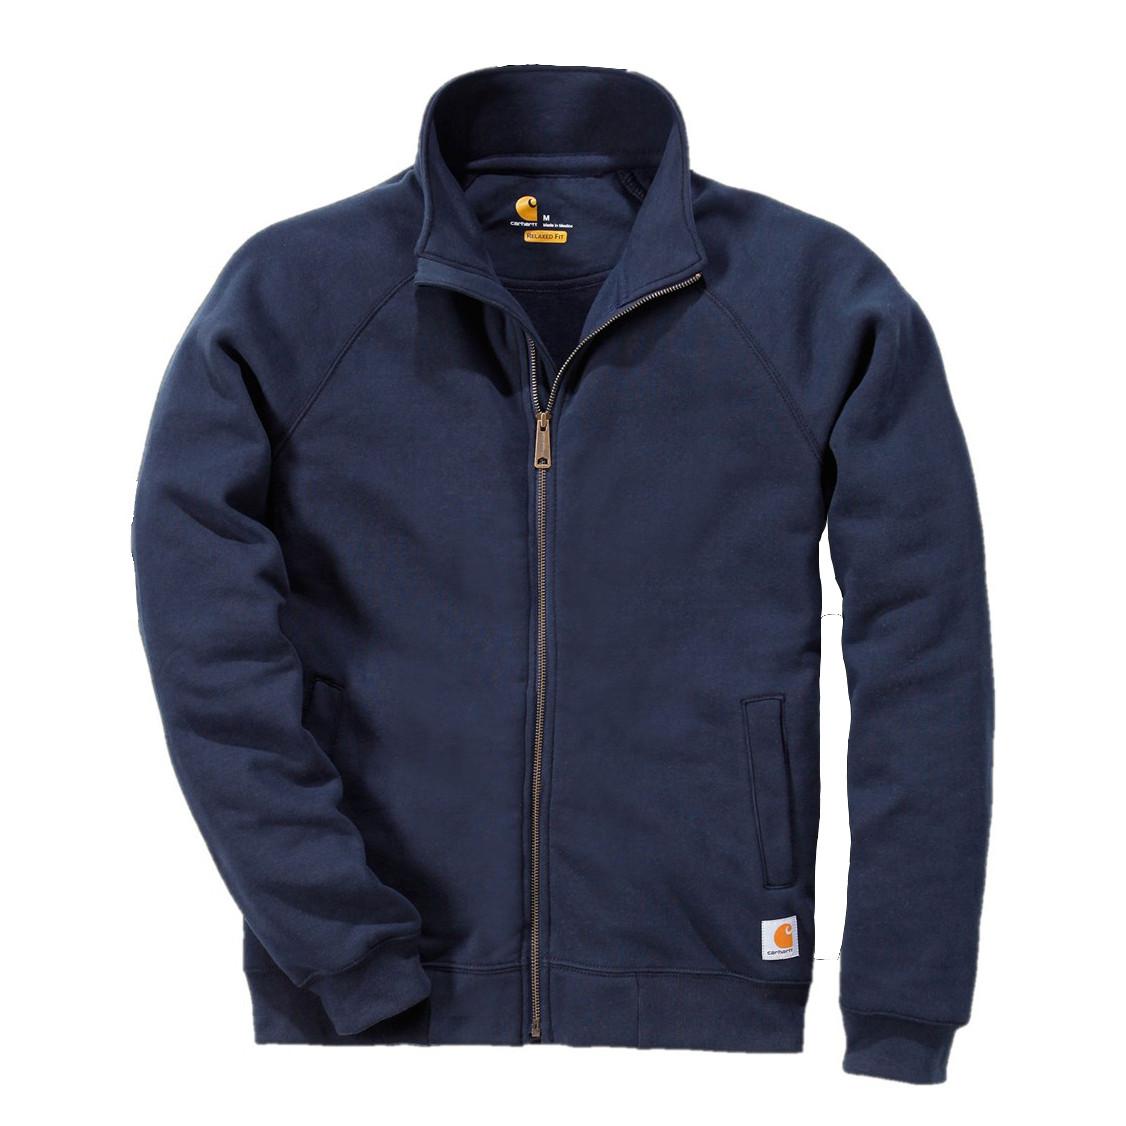 Свитшот на молнии Carhartt Midweight Mock Neck Zip Sweatshirt - K350 (New Navy, XL)